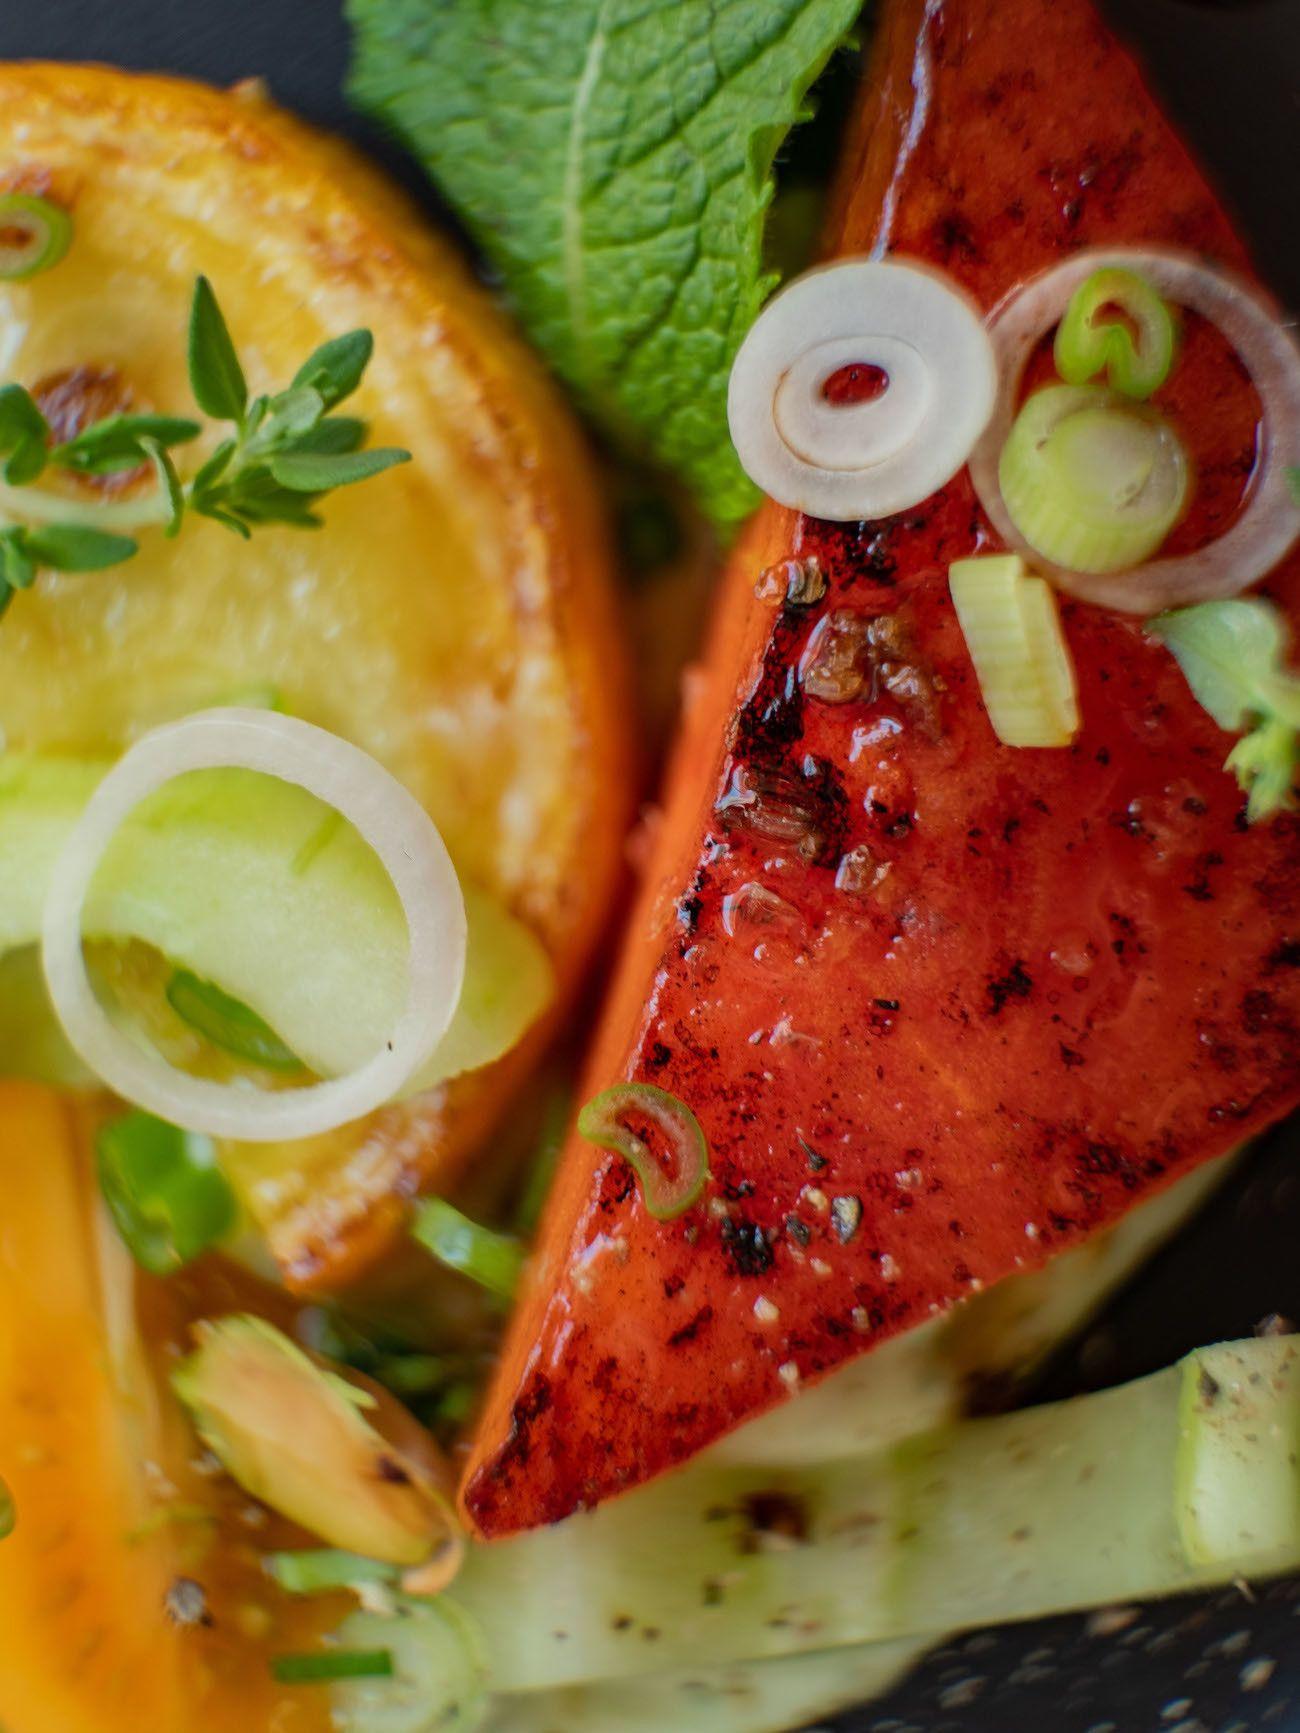 Foodblog, About Fuel, Rezept, Wassermelonensalat auf Basilikum-Feta-Creme, Frühlingszwiebeln, Zucchini, Gurken, Tomaten